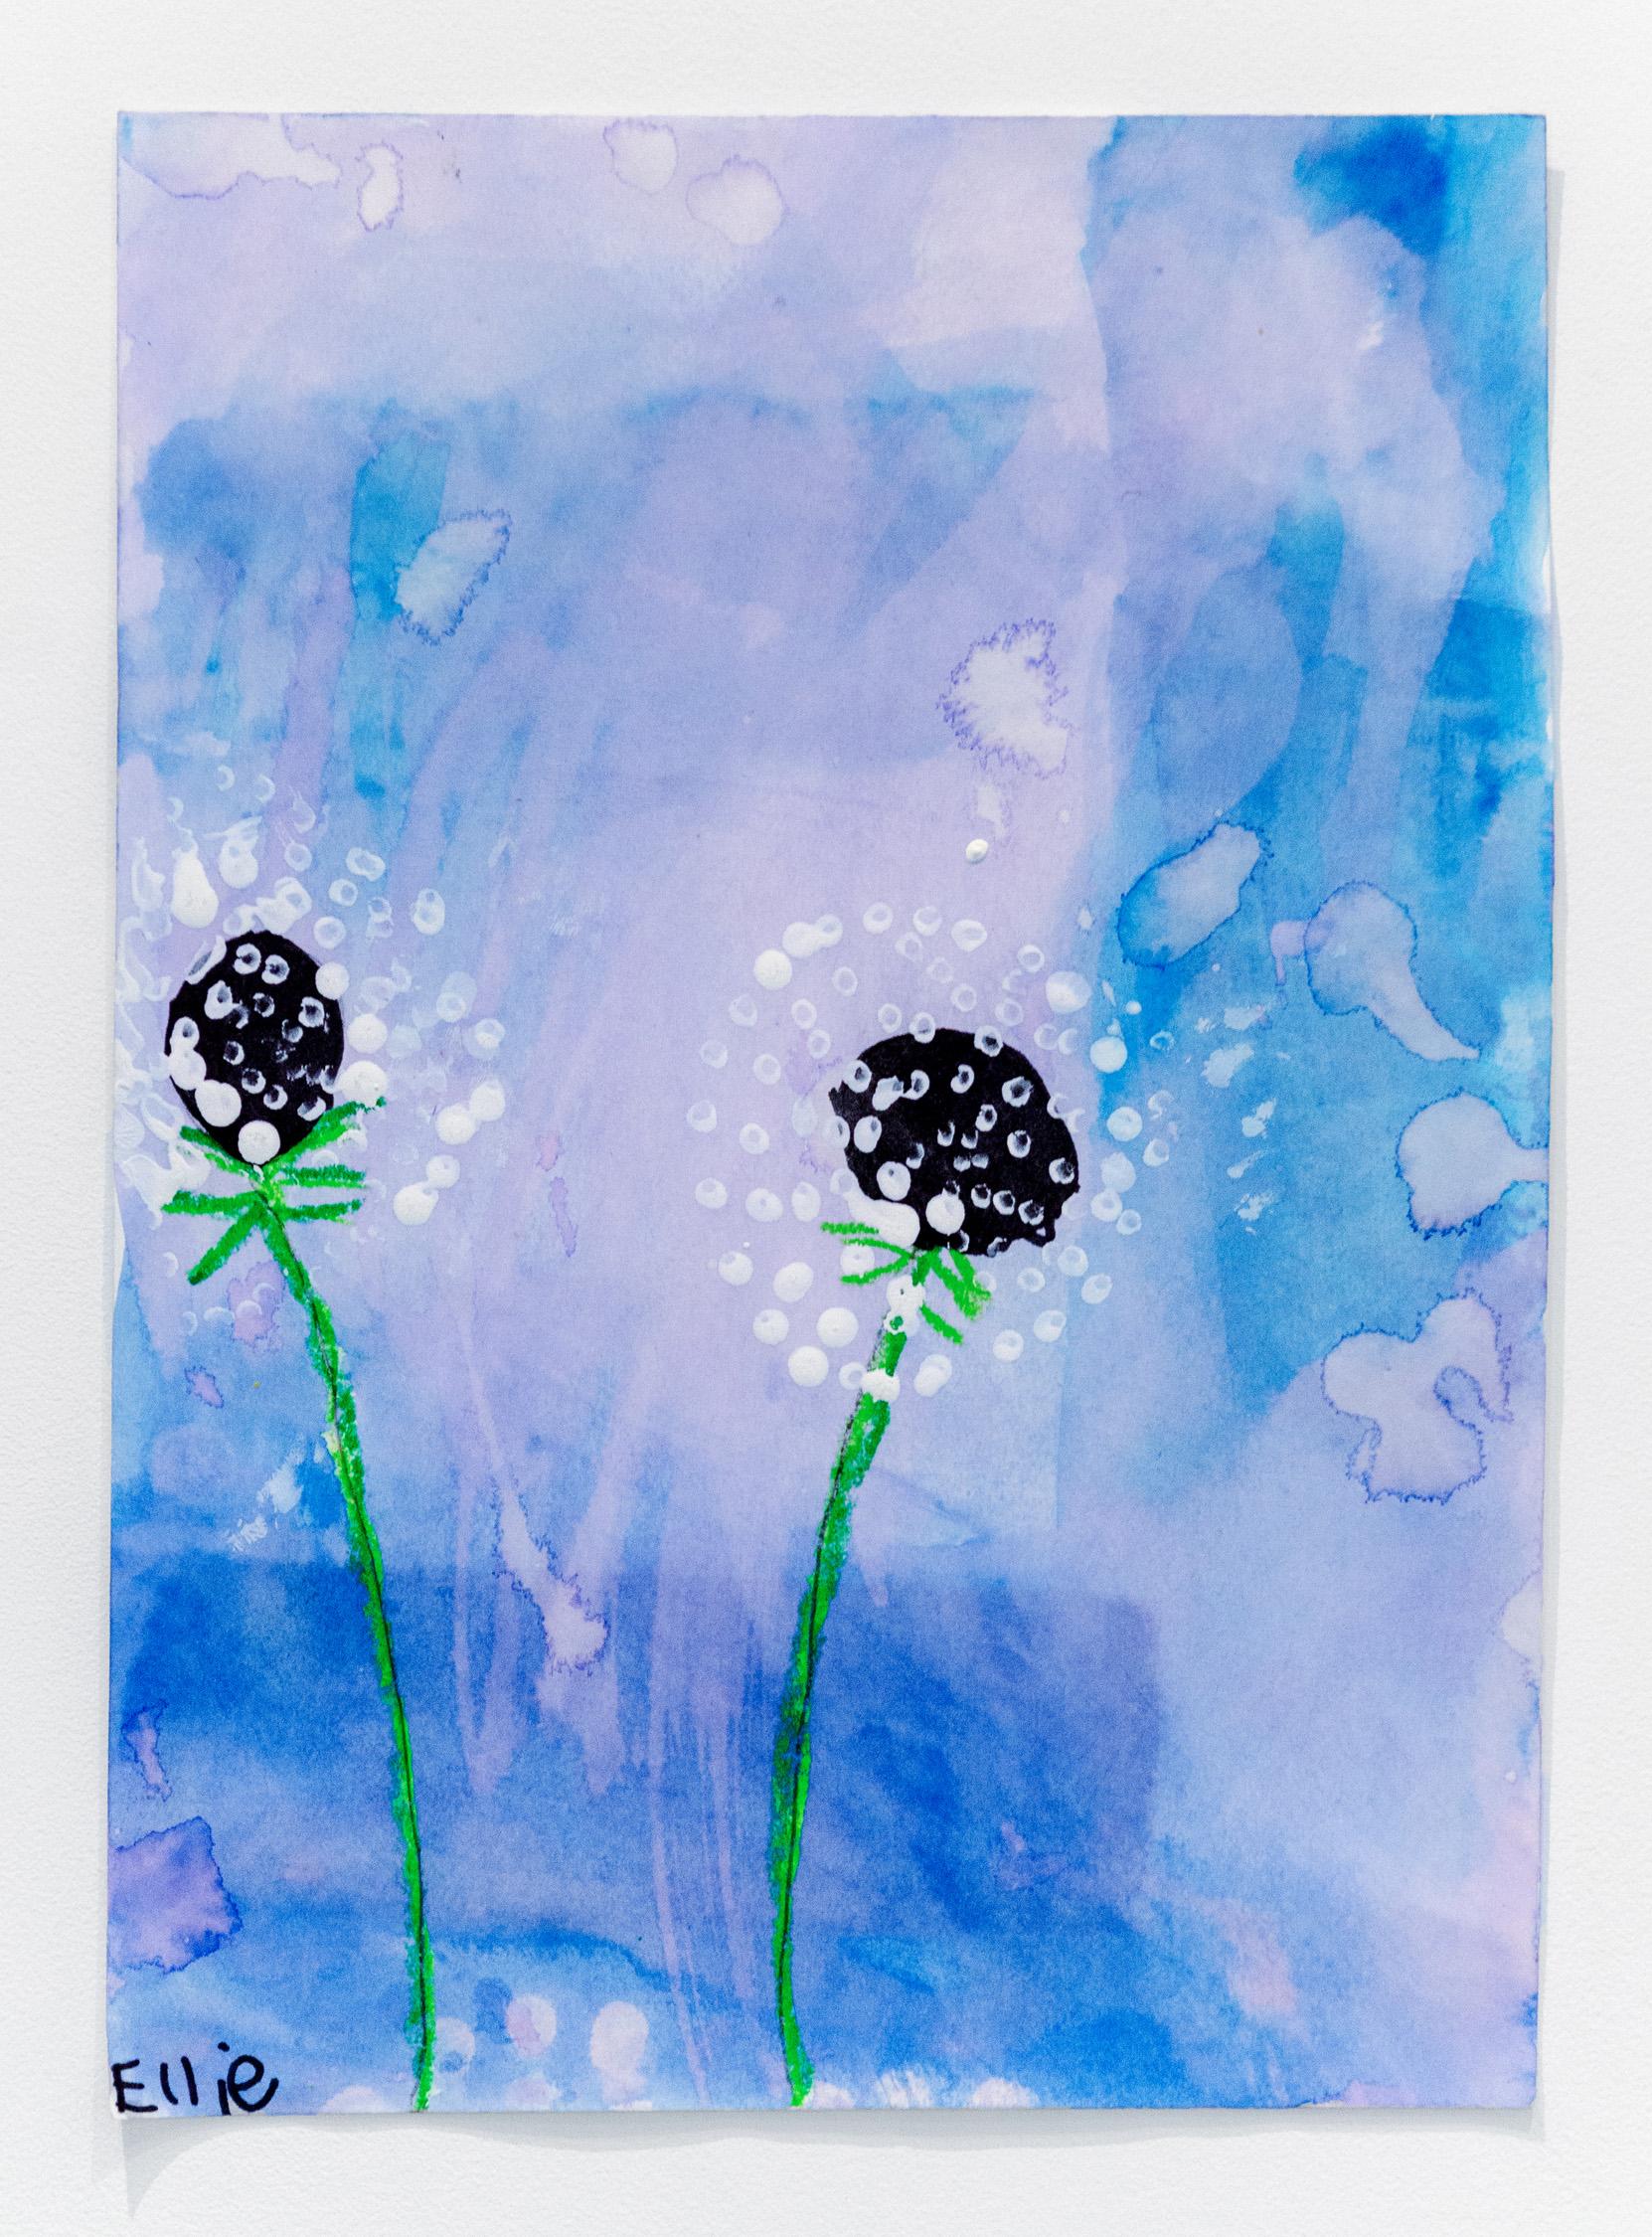 Ellie Rosenblatt   Dandelion Bloom , 2019 Watercolor, pastel and pencil on paper 11.25 x 8.25 inches (28.5 x 21.5 cm)  Starting bid: $20